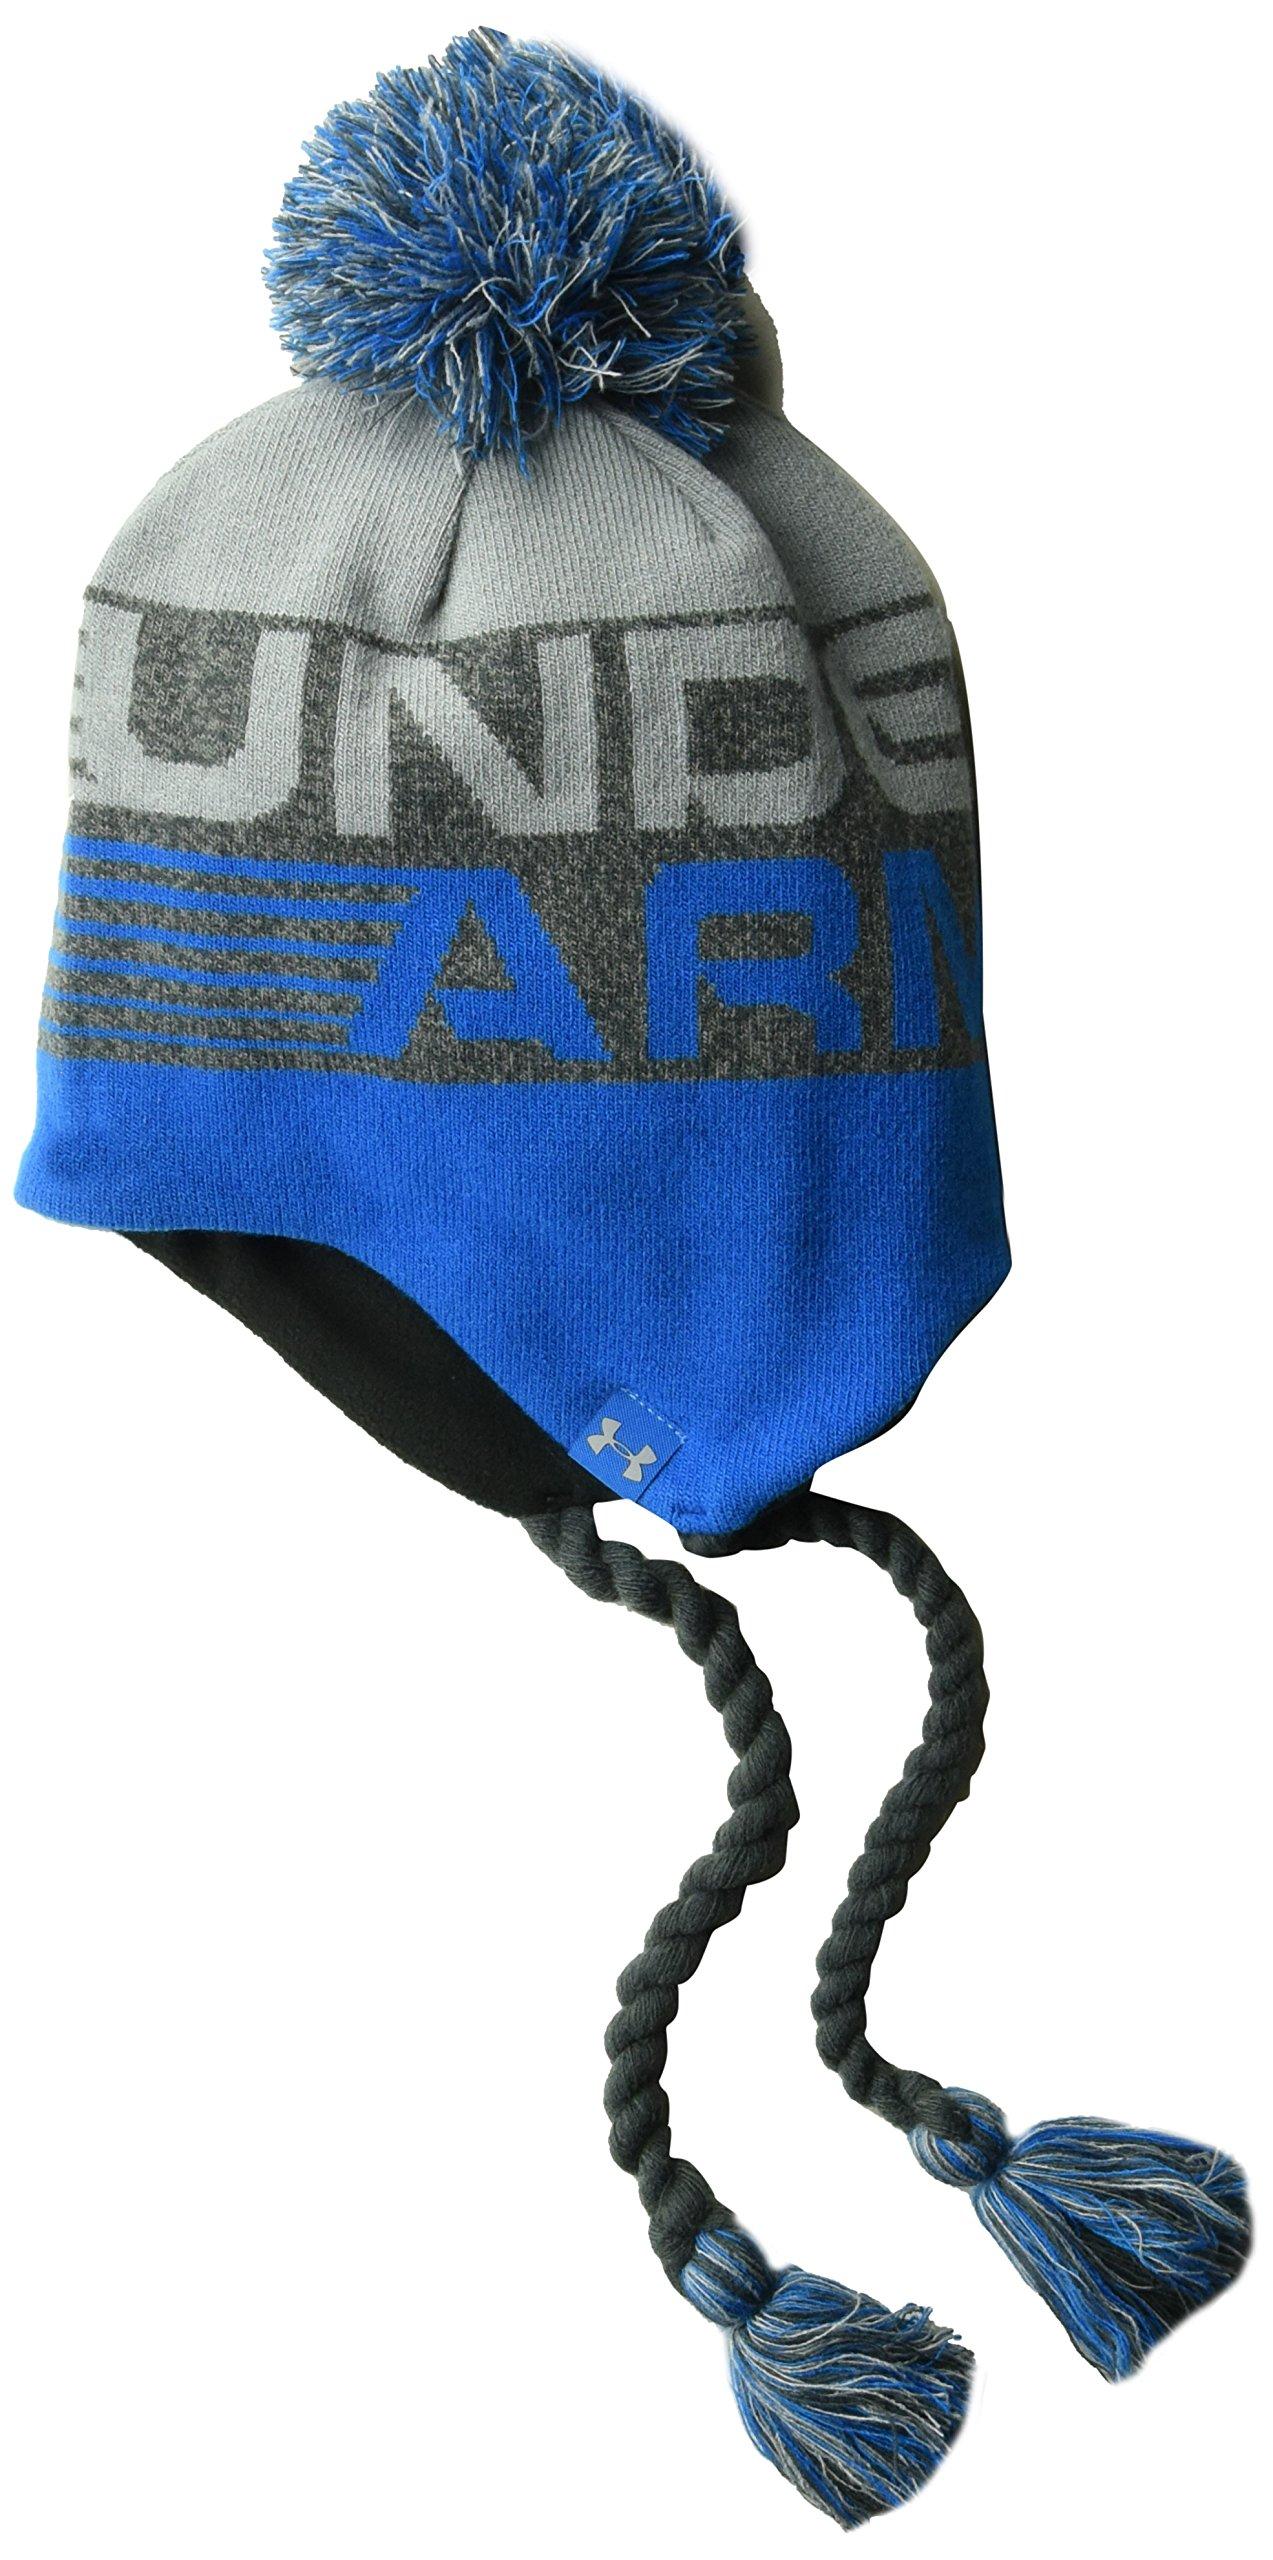 Under Armour Boys' Tassle Beanie, Cruise Blue (899)/Steel, One Size